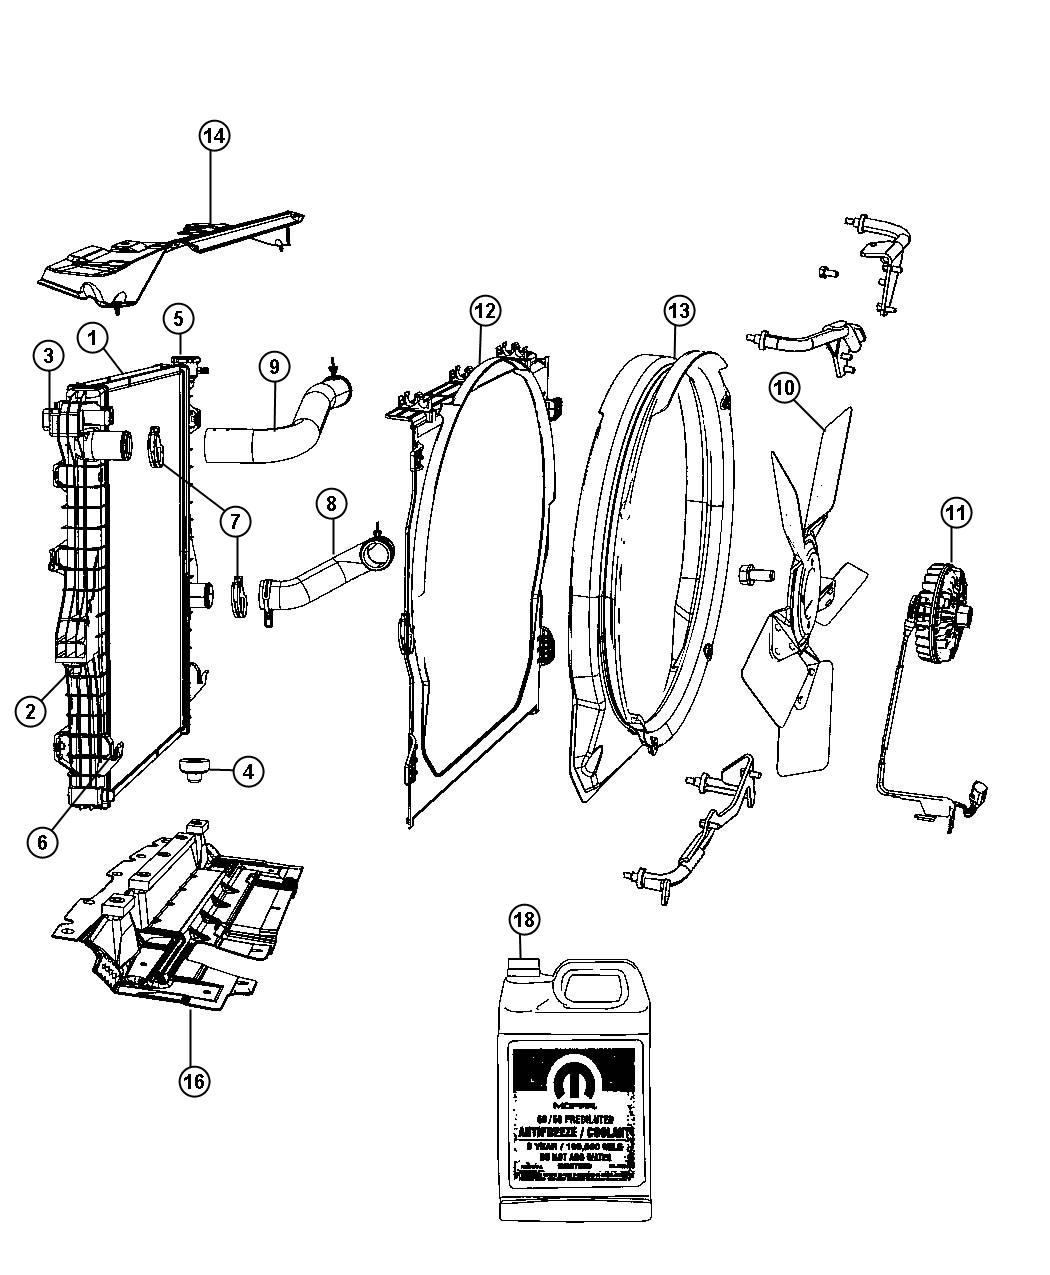 6 7 tem cooling wiring diagram 7 3 | wiring diagram database on jeep  4 0 wiring diagram, 7 3l